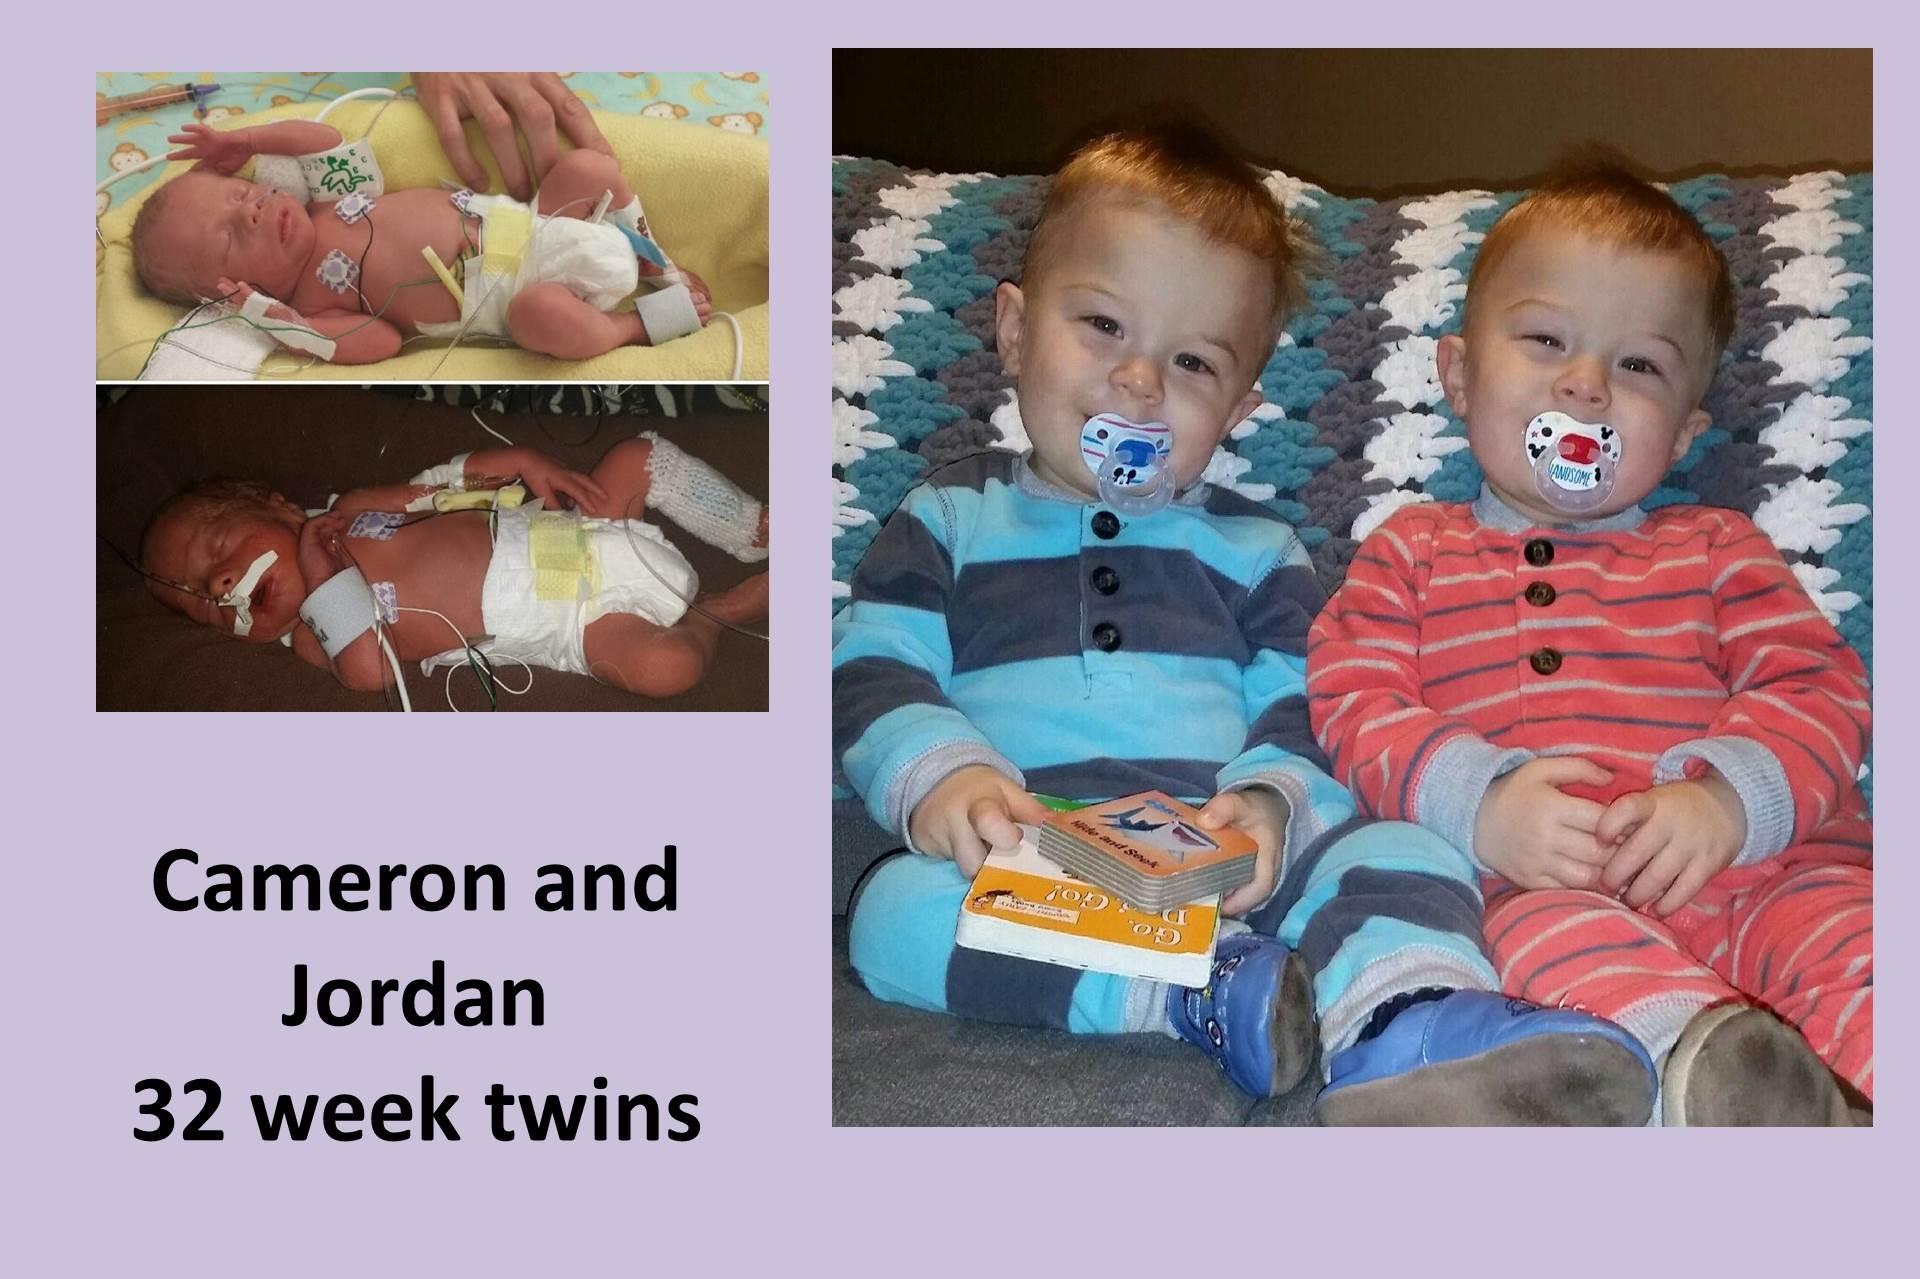 Hallway of Hope: Cameron and Jordan